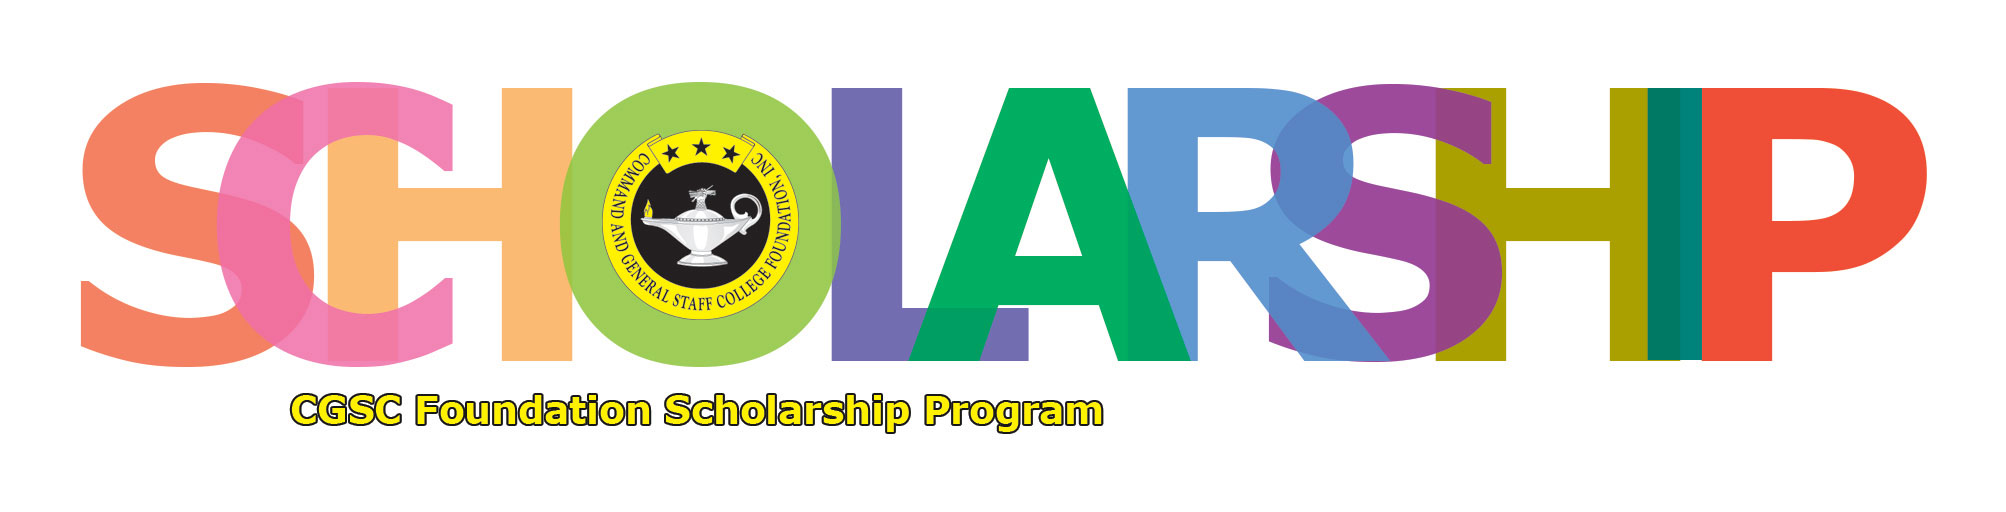 CGSCF Scholarship Program logo